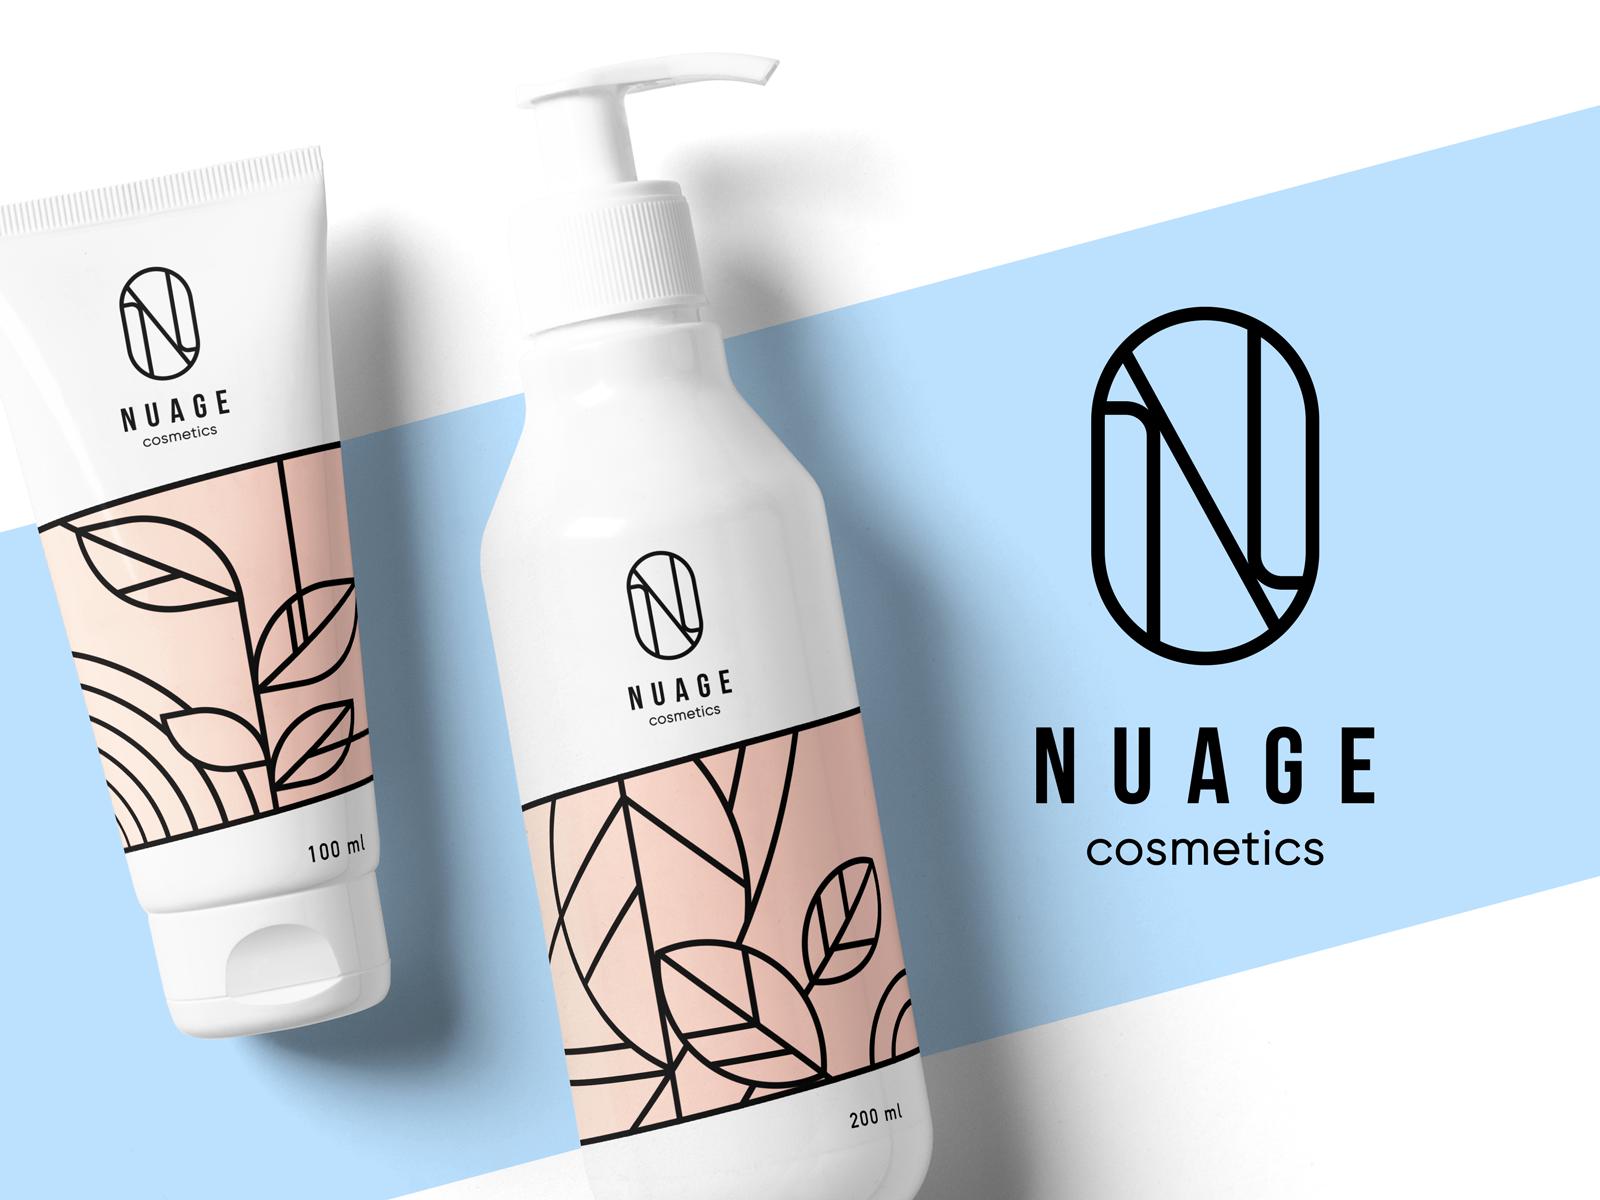 Tubik nuage cosmetics identity design